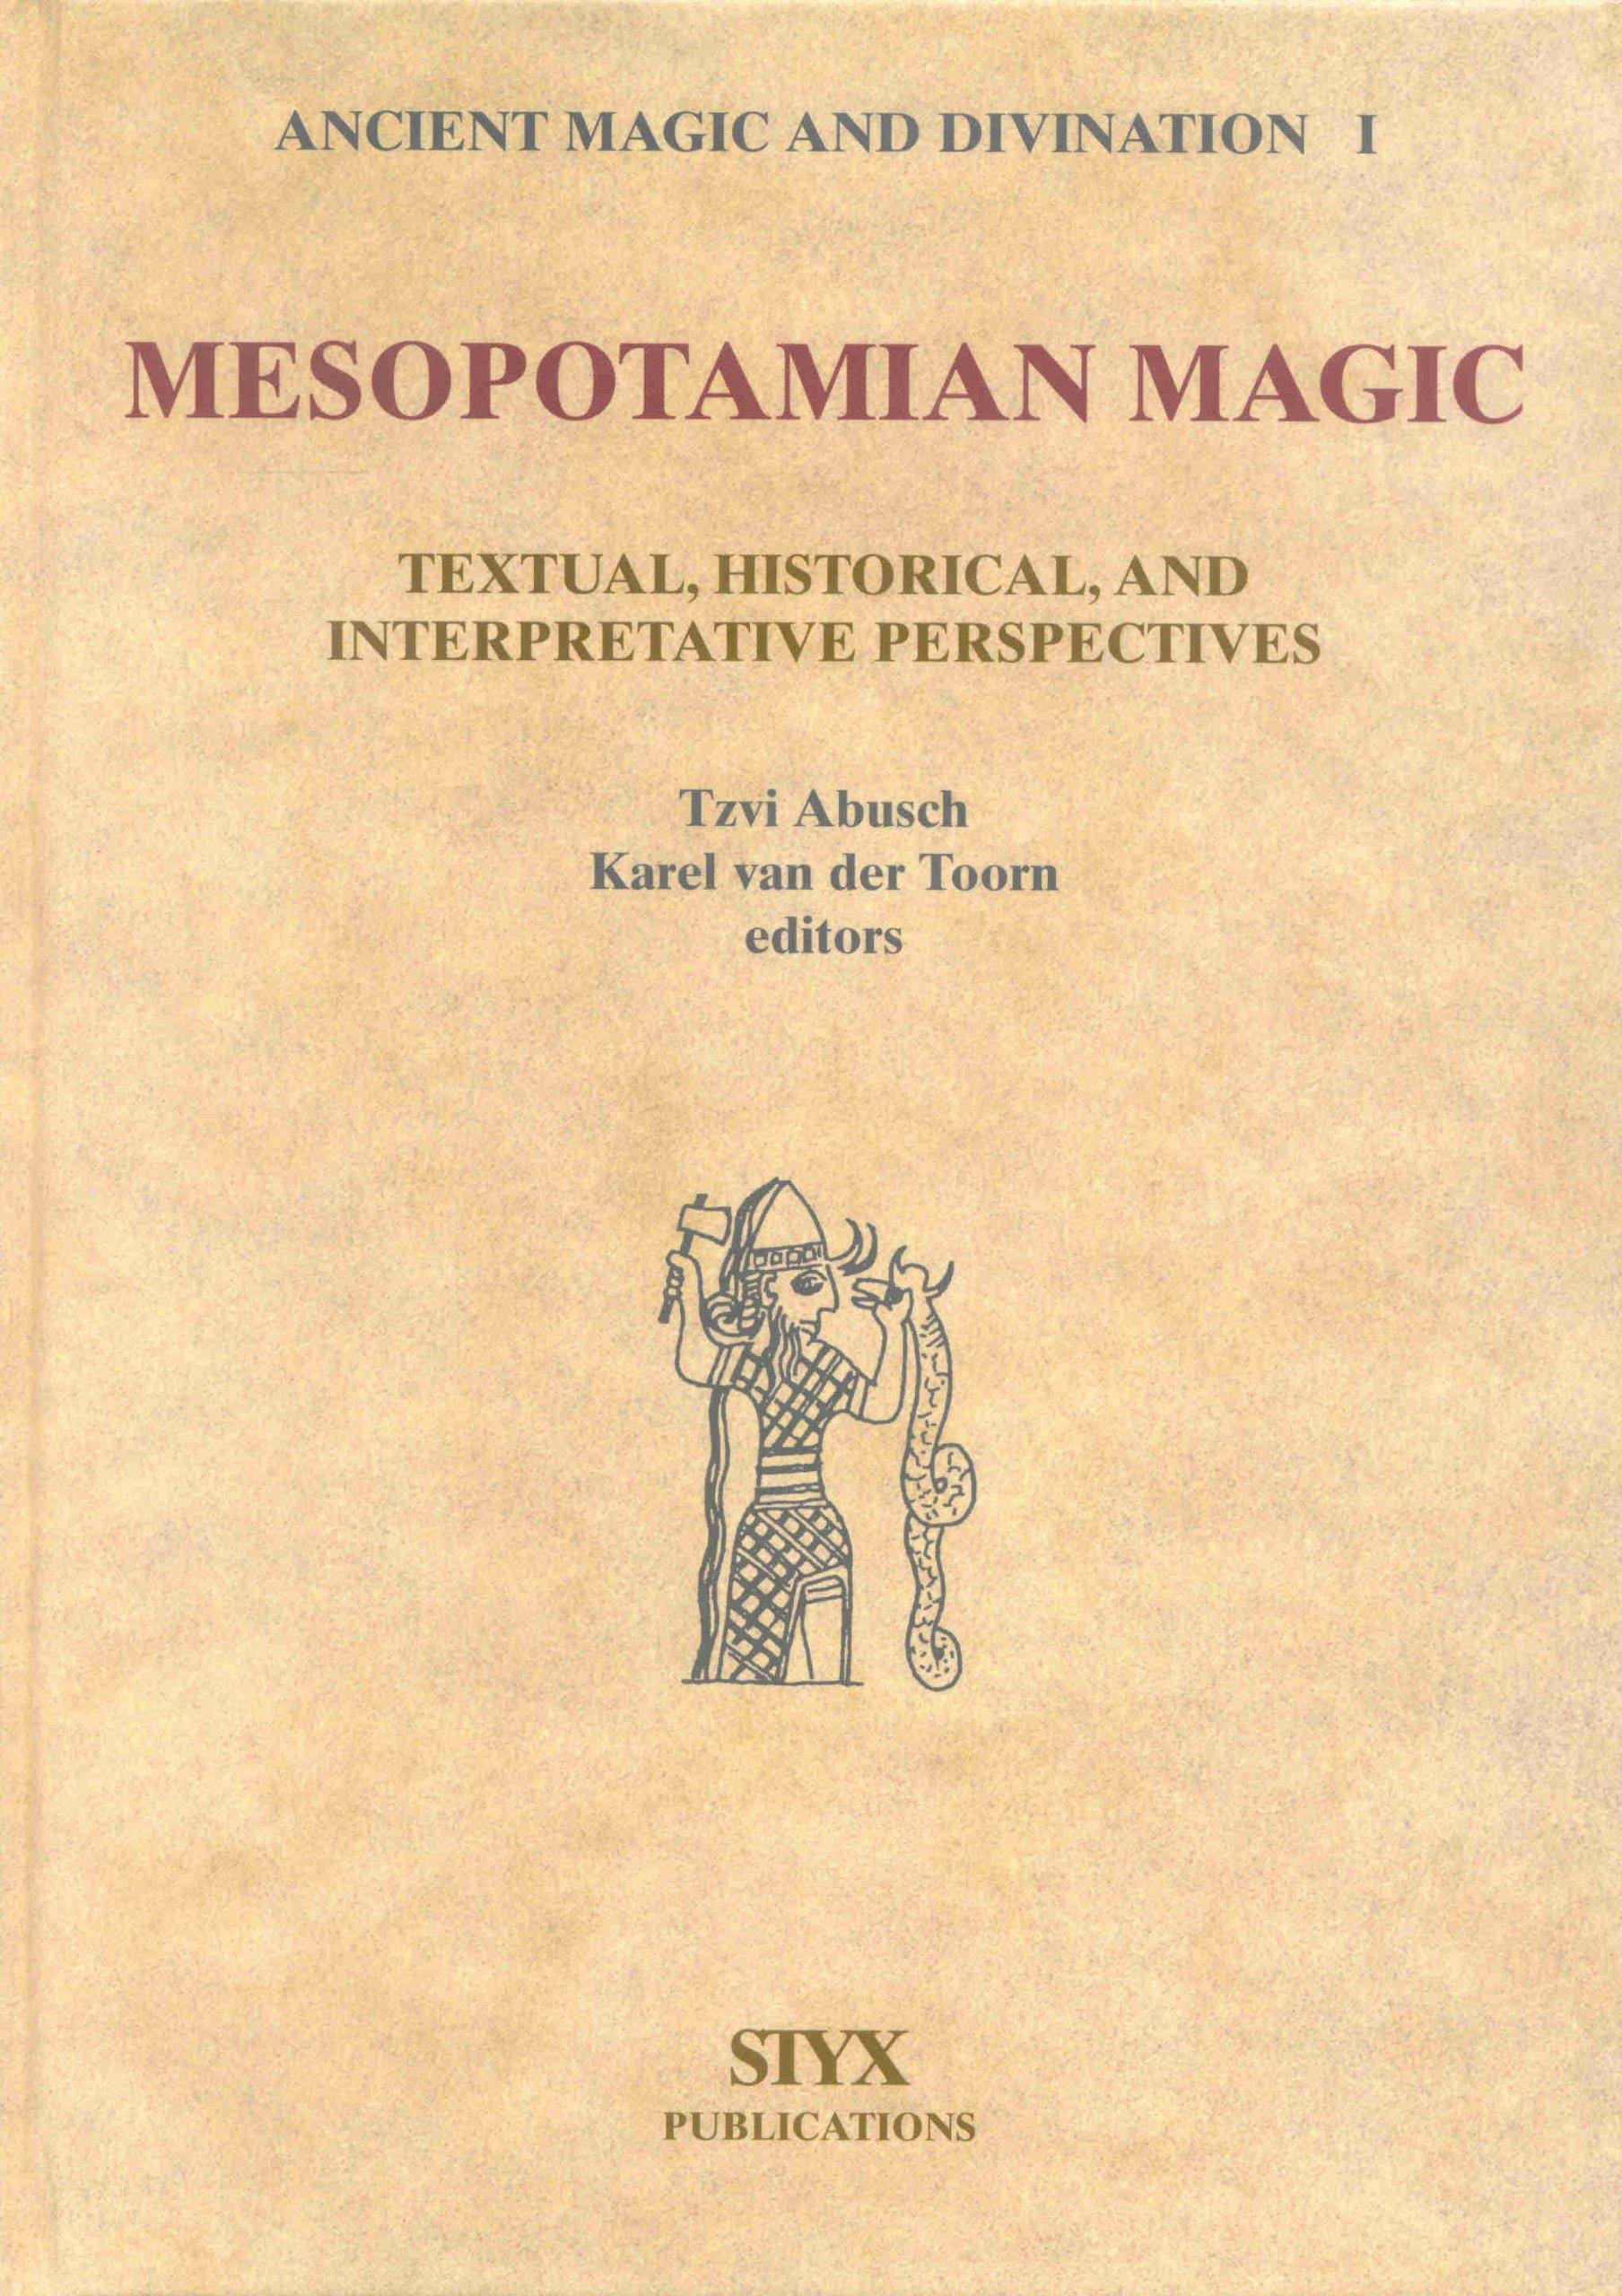 Mesopotamian Magic: Textual, Historical, and Interpretative Perspectives (Studies in Ancient Magic and Divination, 1) pdf